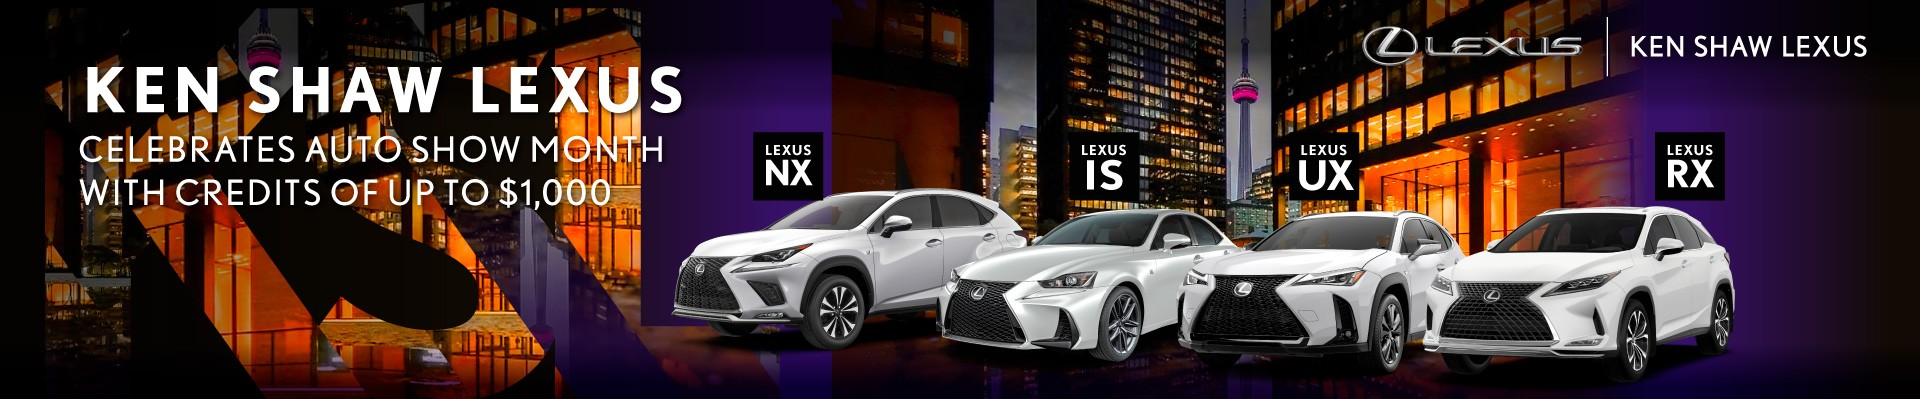 Ken Shaw Lexus offers on new Lexus vehicles, lease, finance deals in Toronto, Ontario, GTA